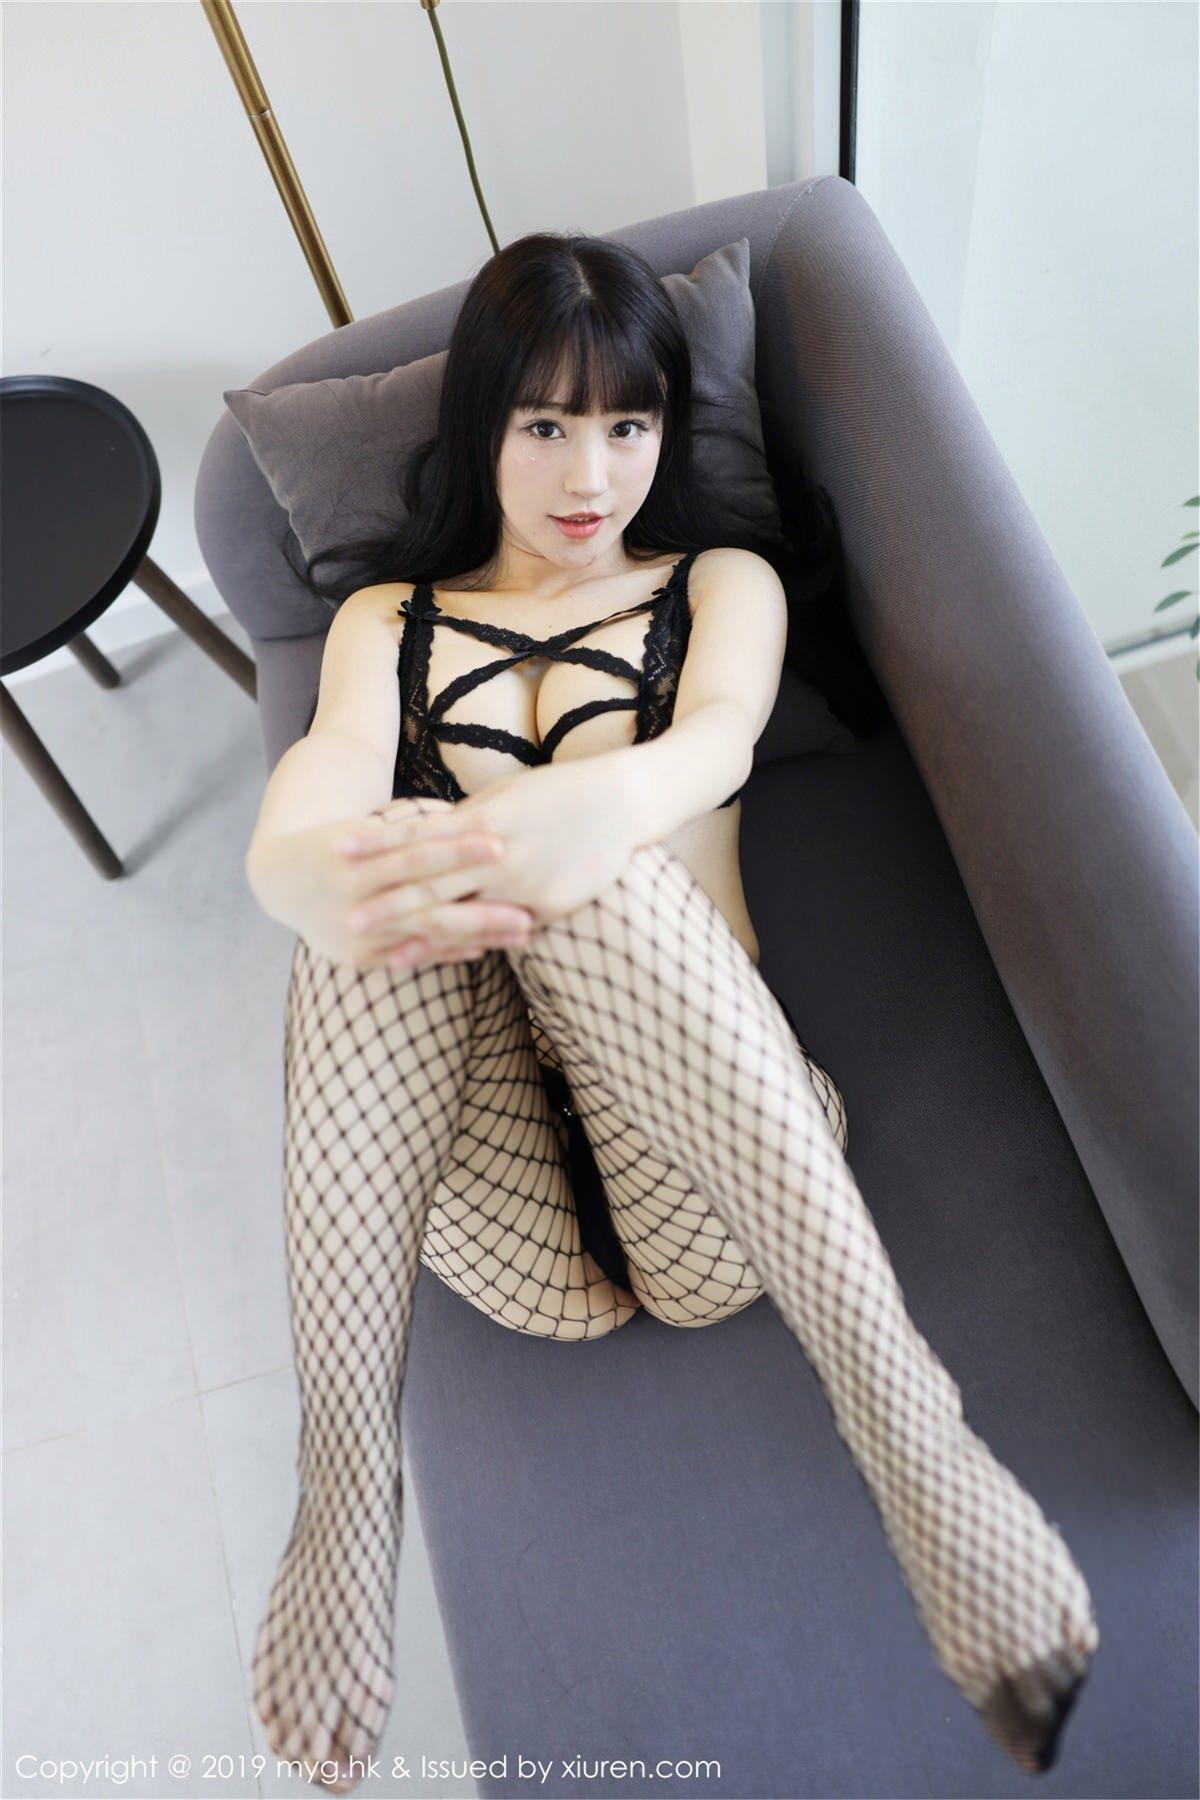 MyGirl Vol.357 17P, mygirl, Zhu Ke Er